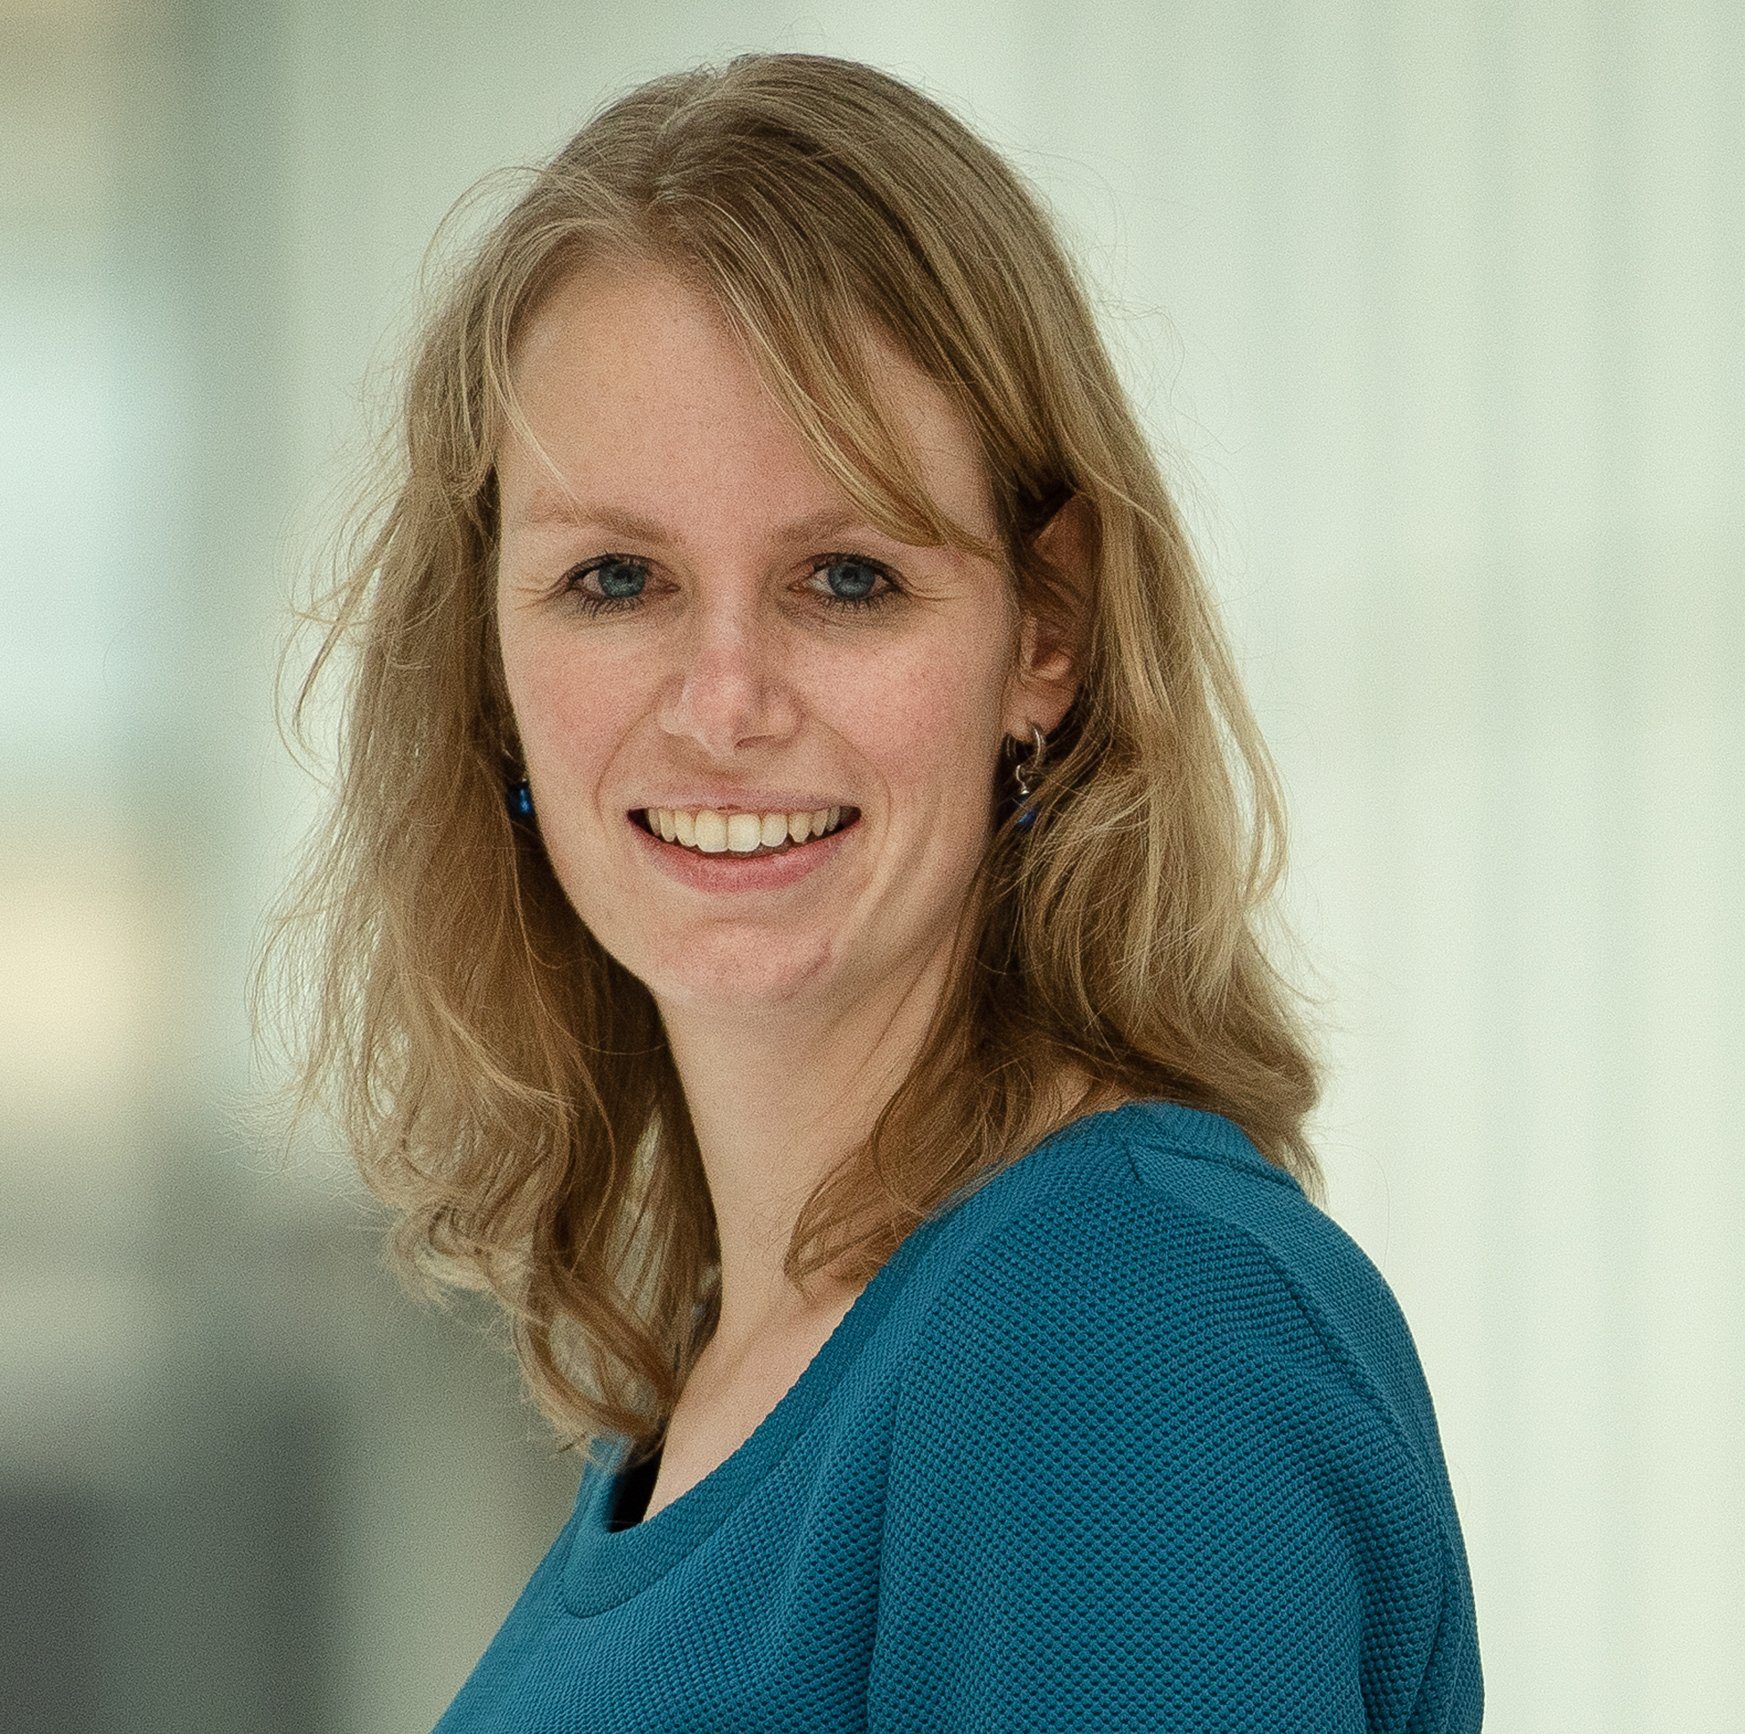 Dr. Esther Bron